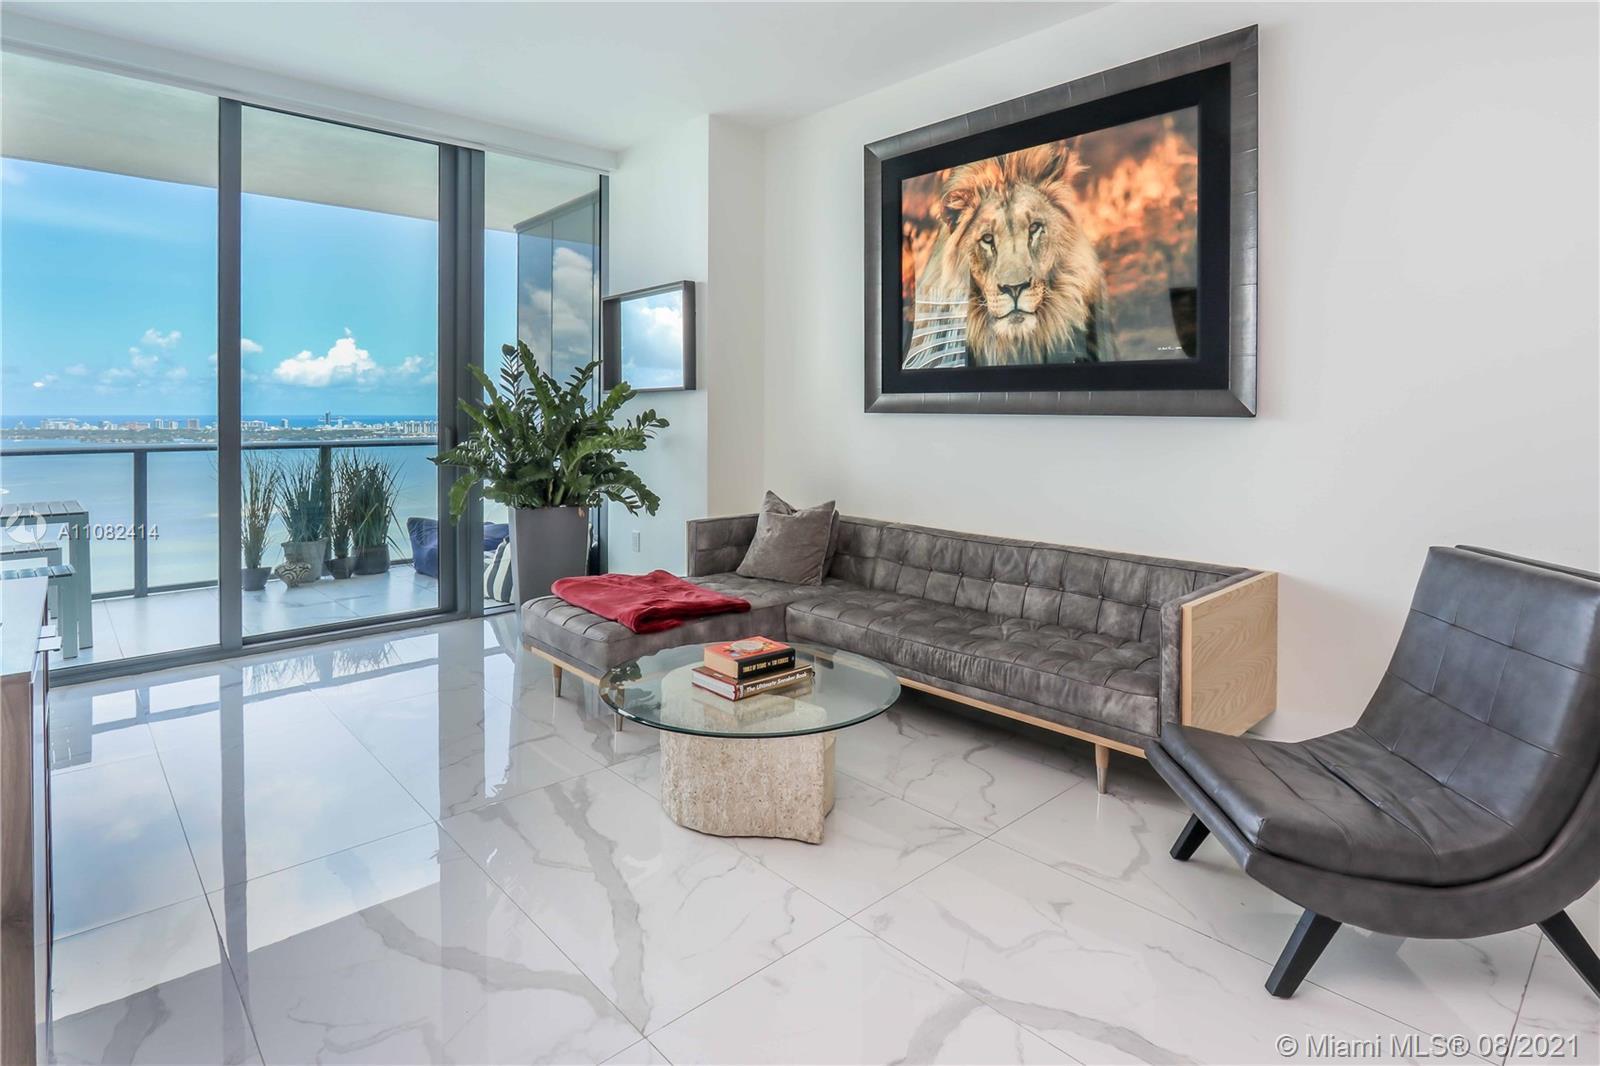 Photo of GRAN PARAISO CONDO Apt 4003 that clicks through to the property detail page